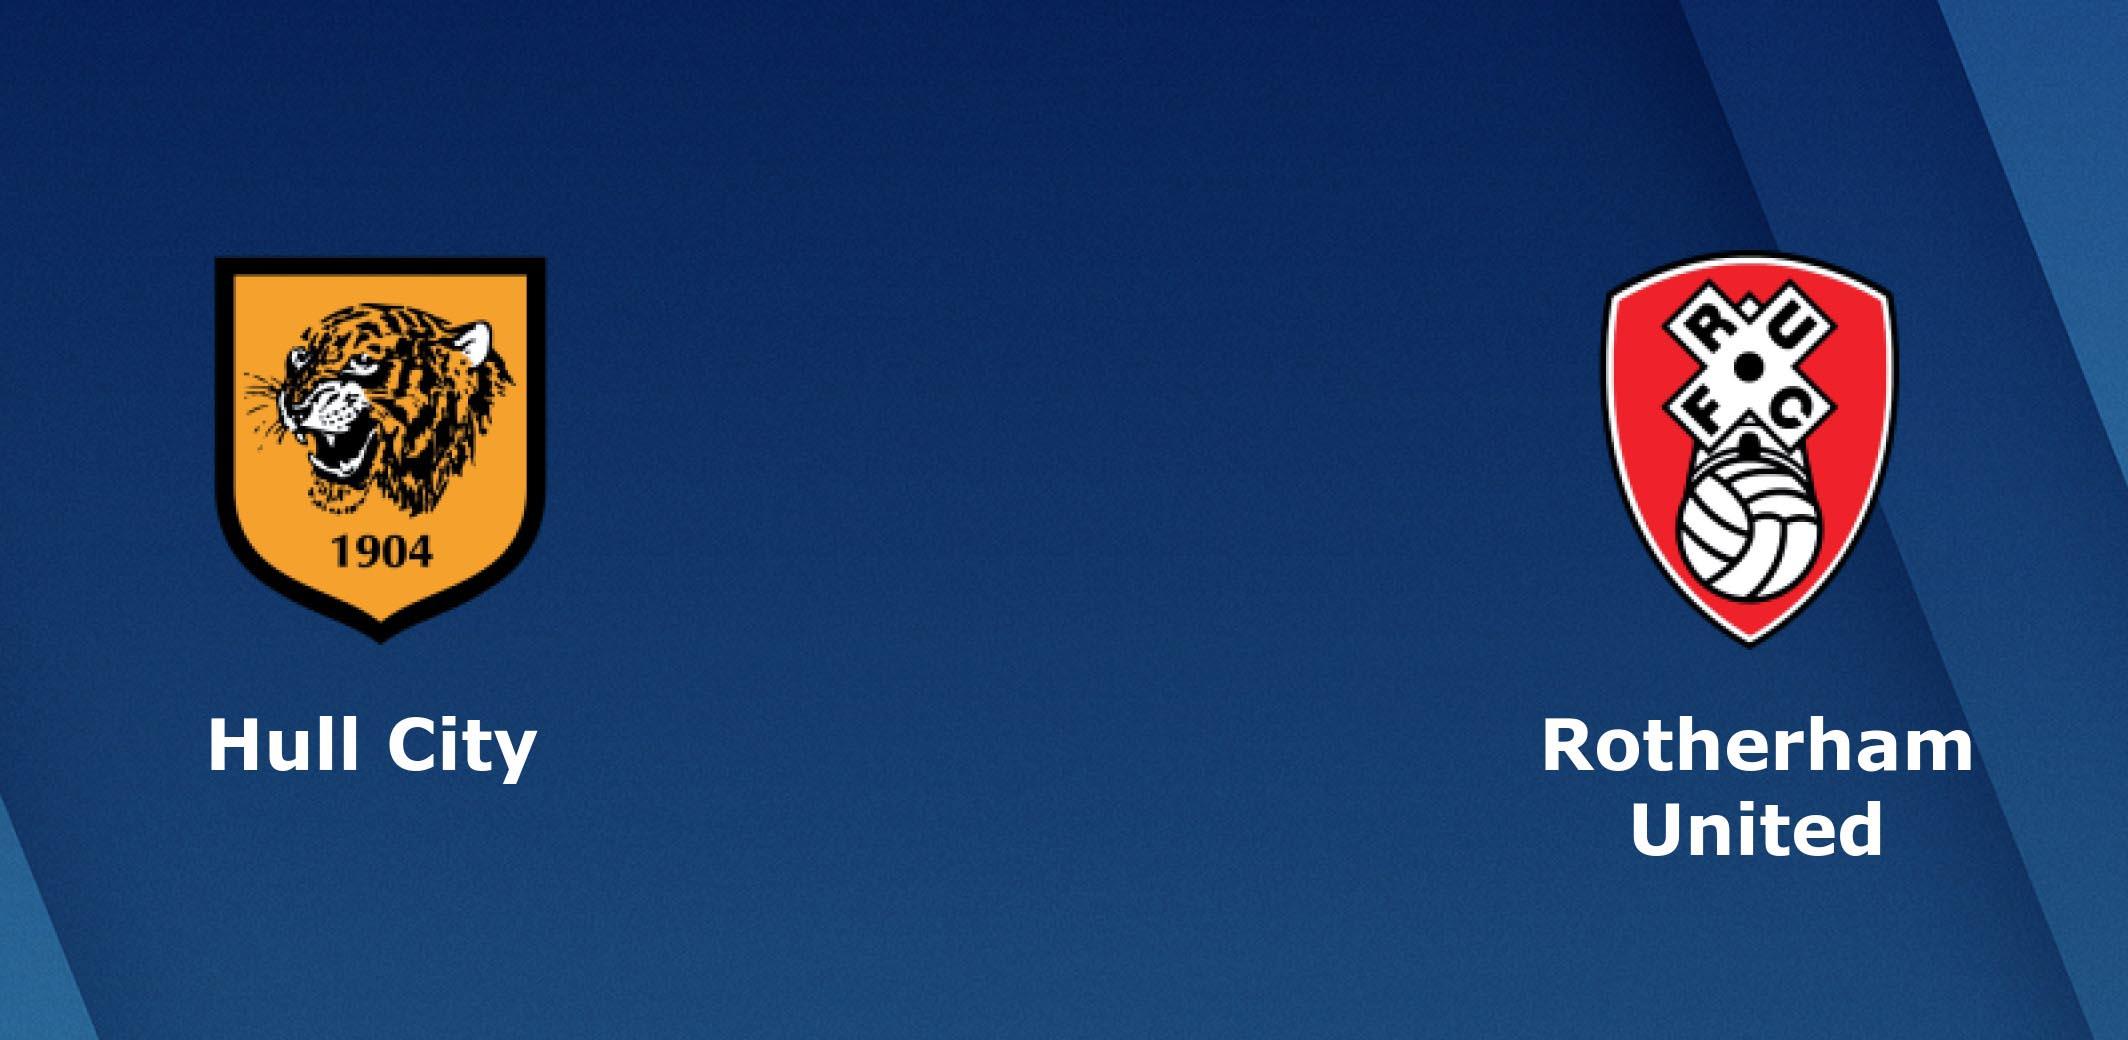 tip-keo-bong-da-ngay-12-02-2019-hull-city-vs-rotherham-united-1